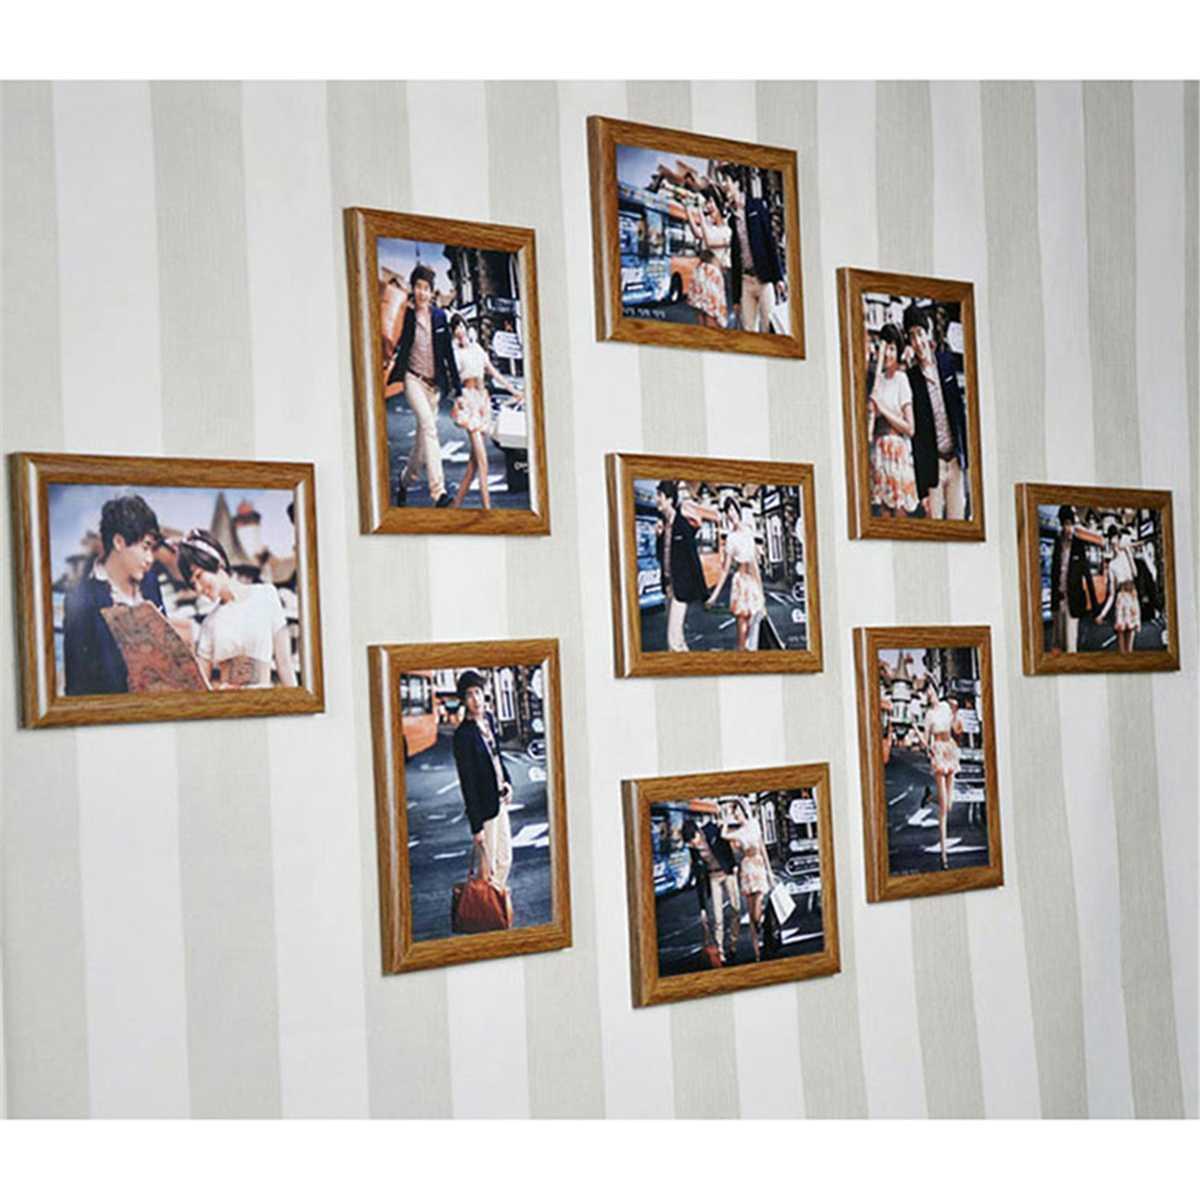 9 Pieces Family Vintage Photo Frame Home Decor Art Wooden